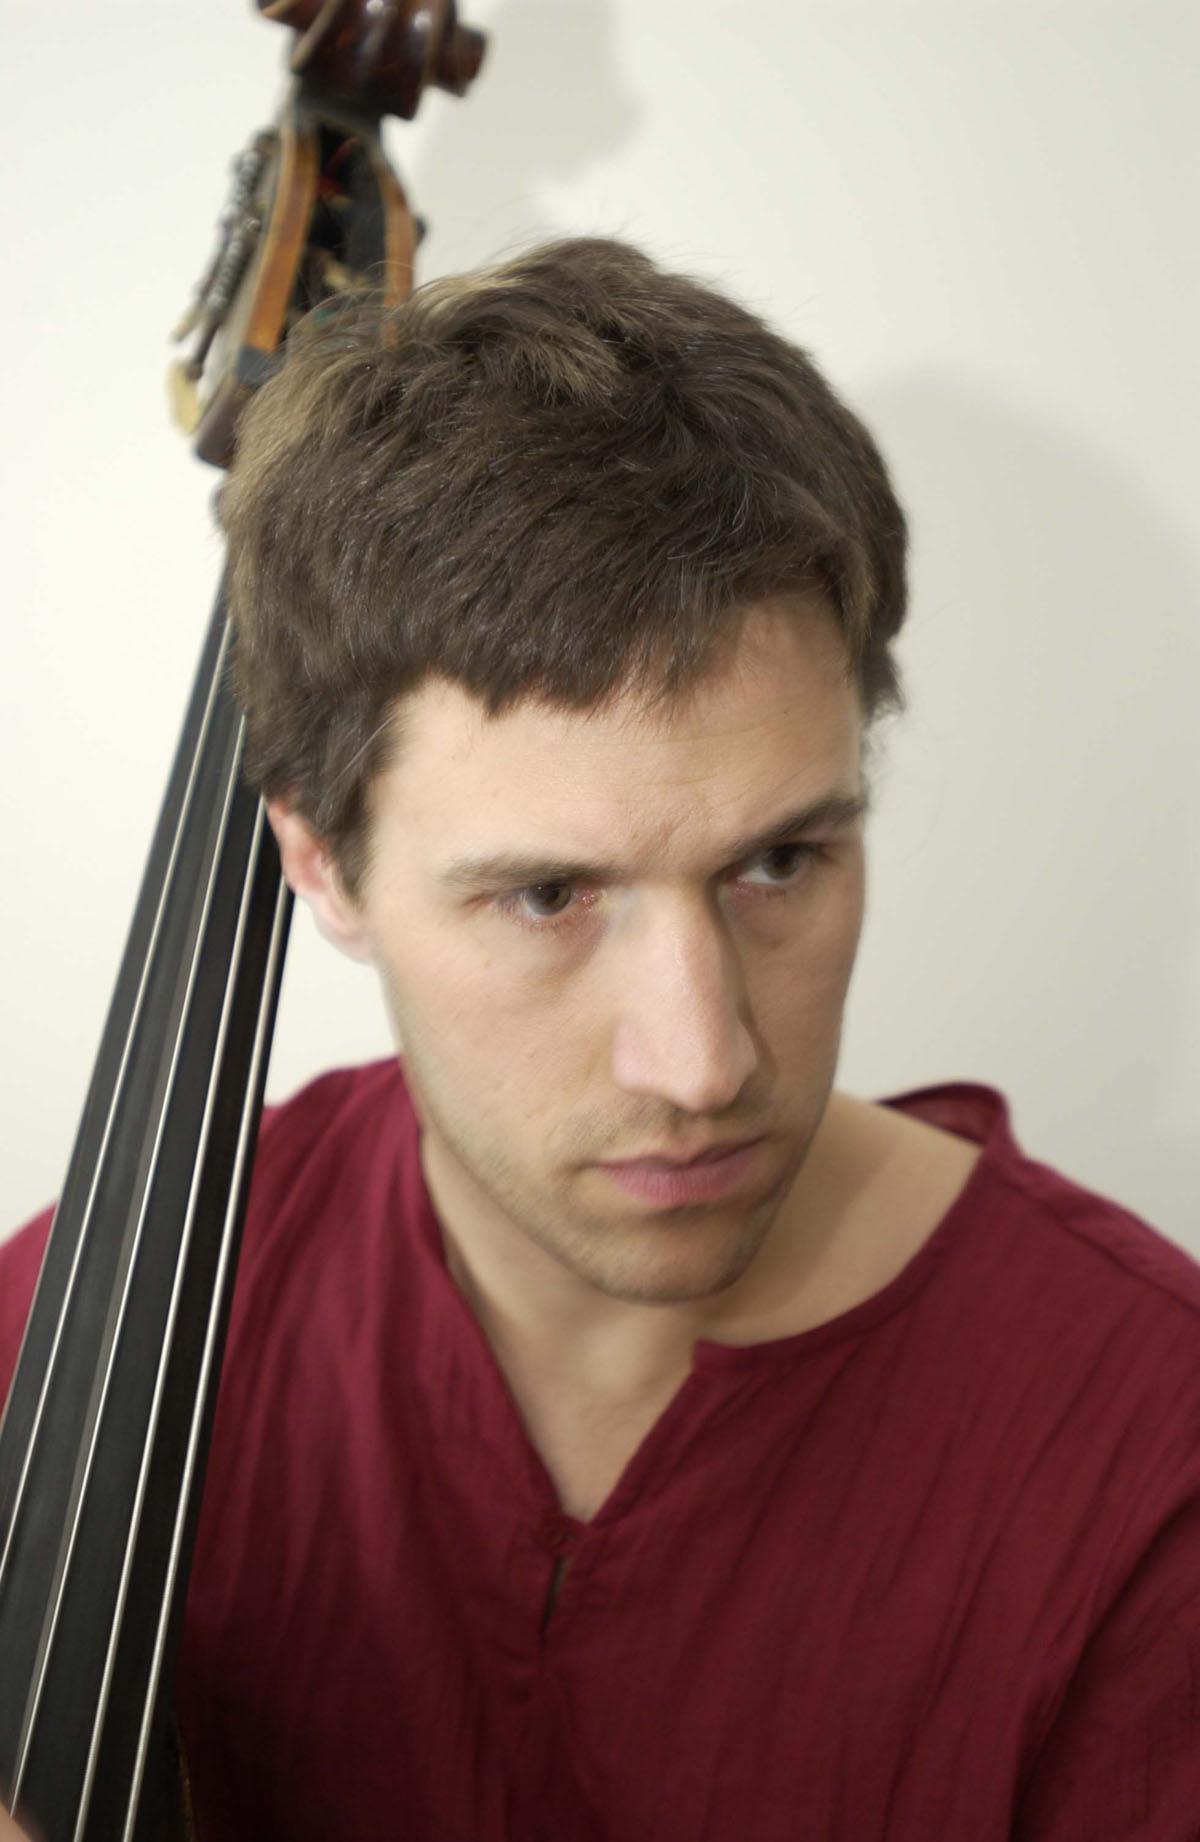 Joshua Davis with his upright bass.